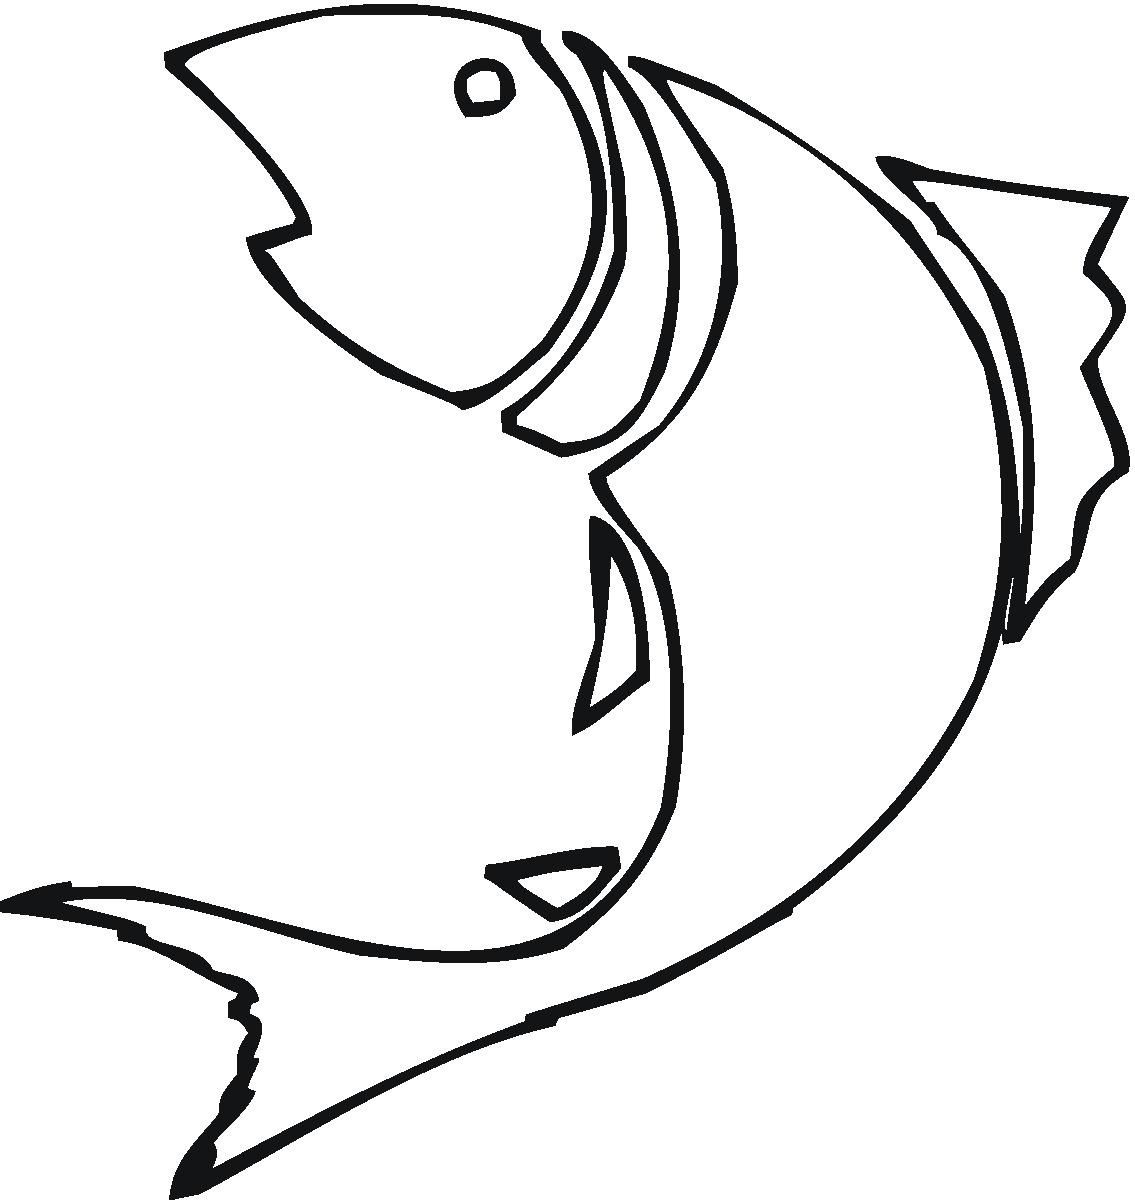 Aquarium clipart drawing. Fish outline best patterns